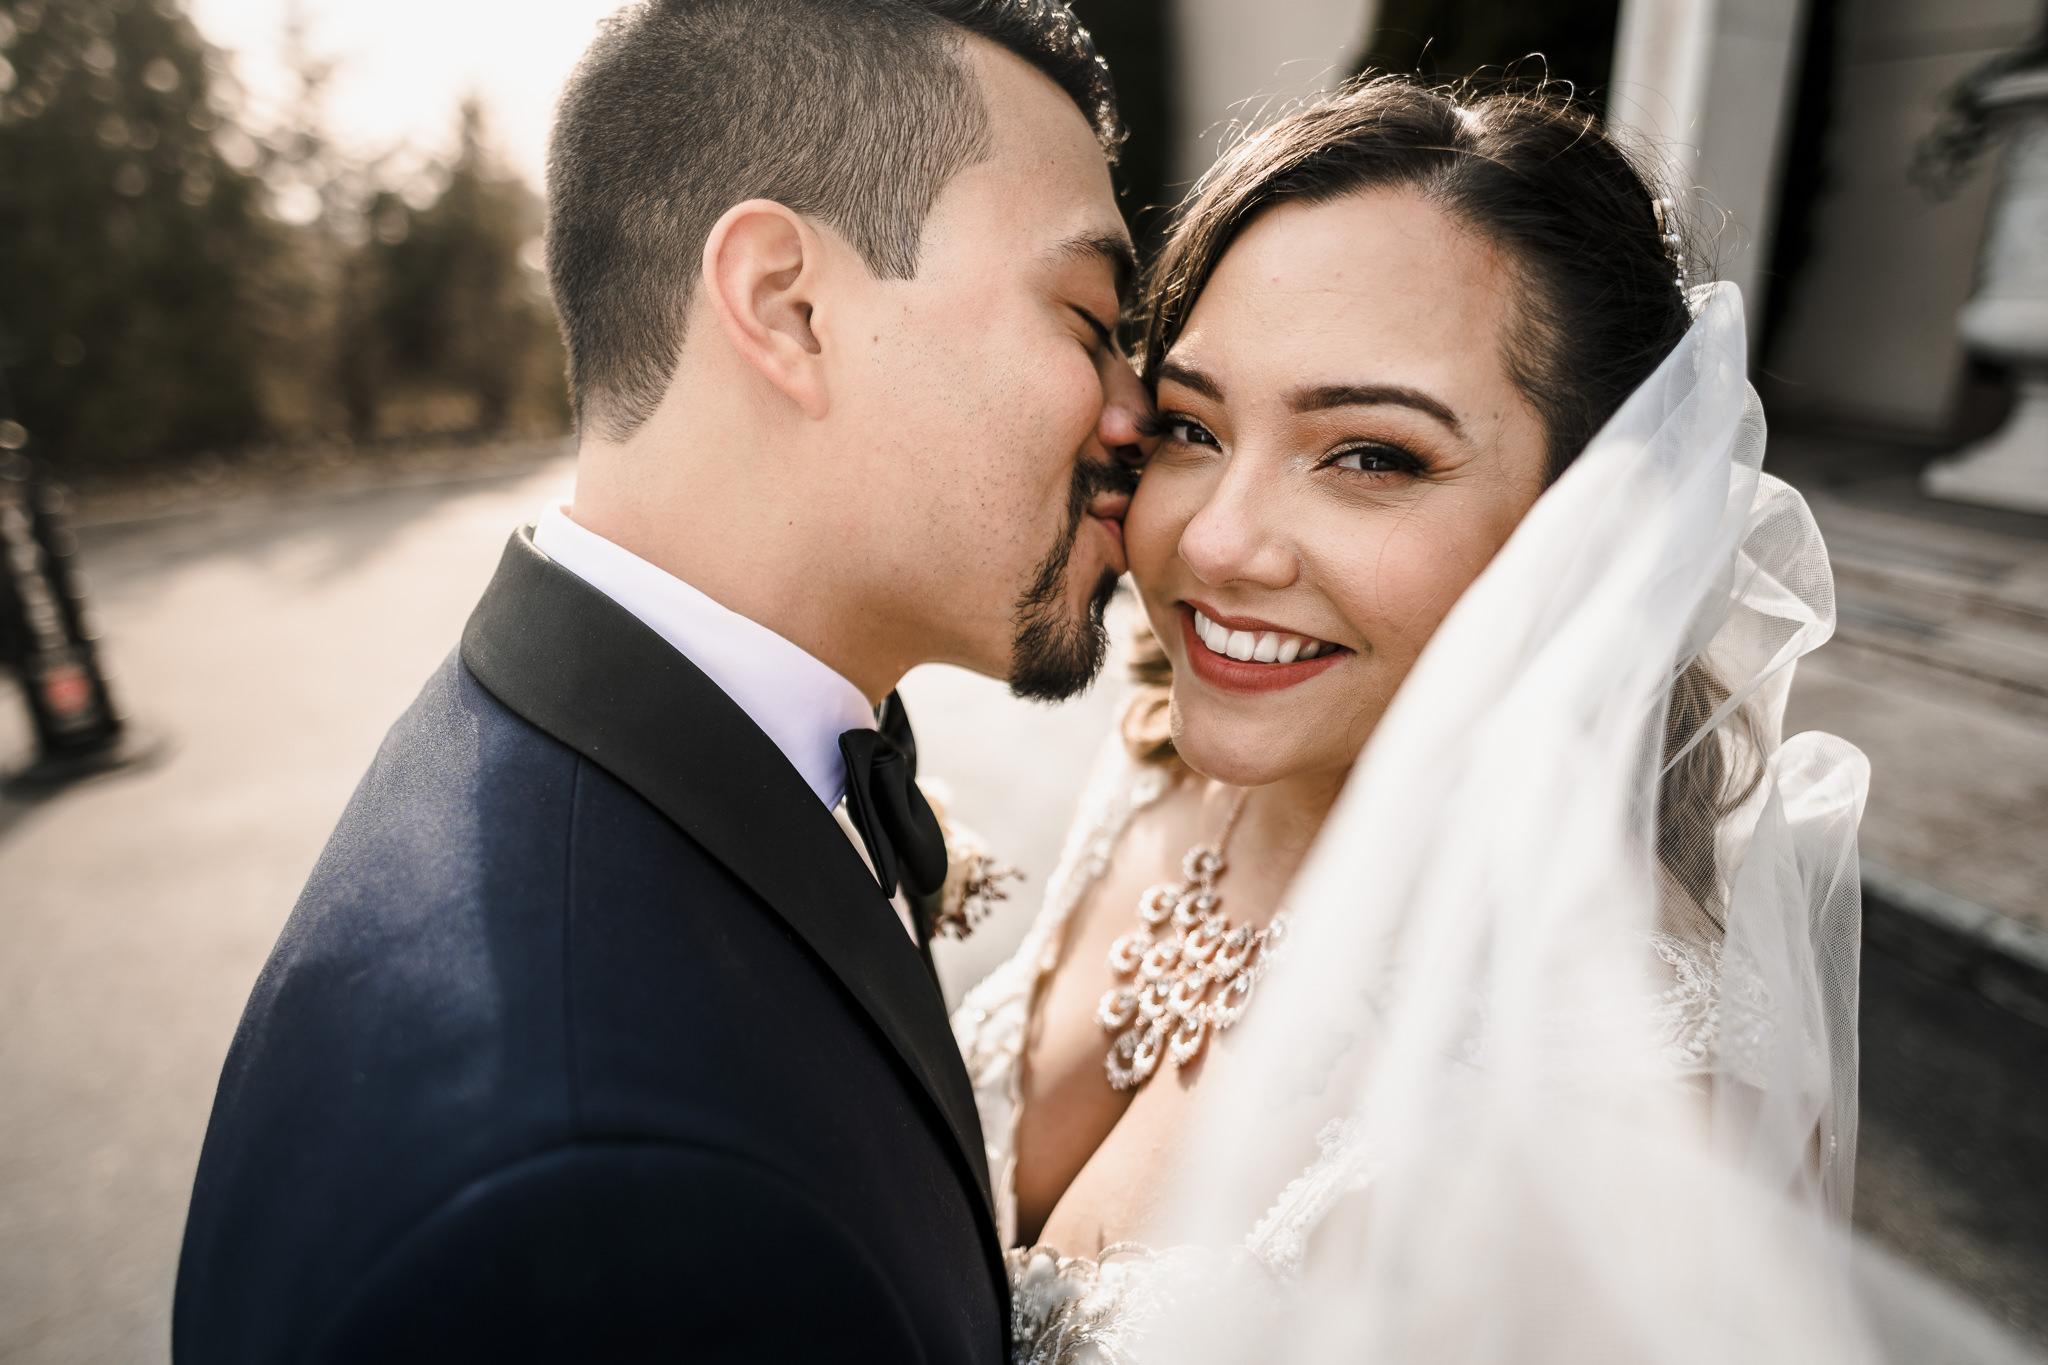 Sanchez-Leonards-Palazzo-New-York-Wedding-Photographer-27.JPG